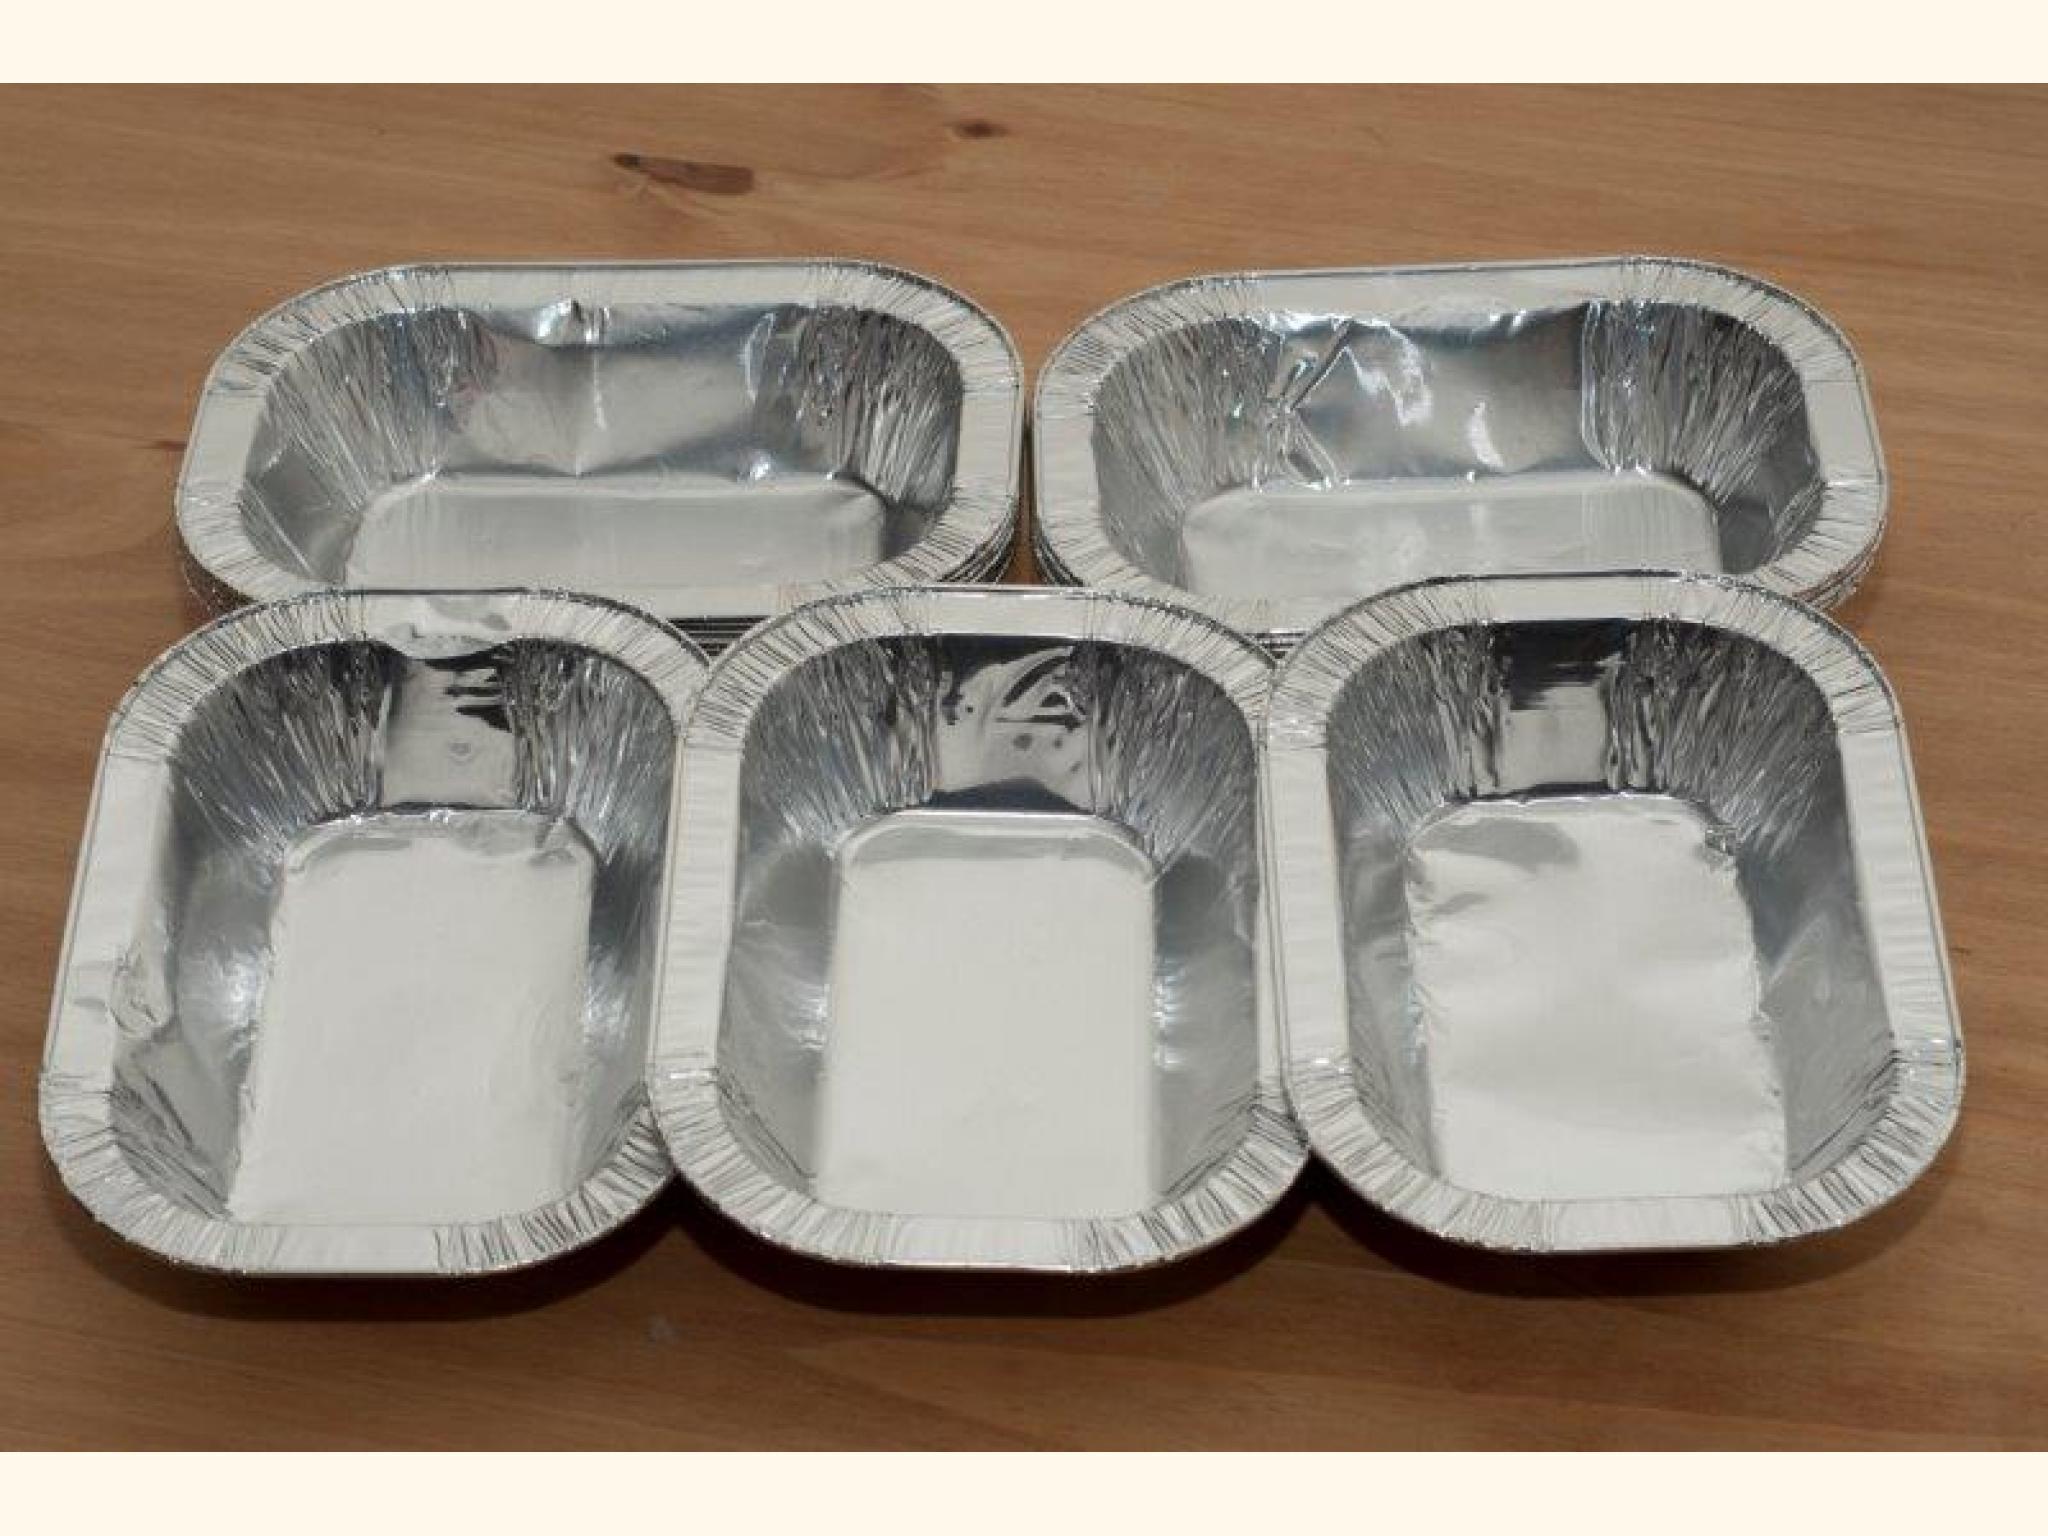 1LB Foil Pie Ashet Dish x 200